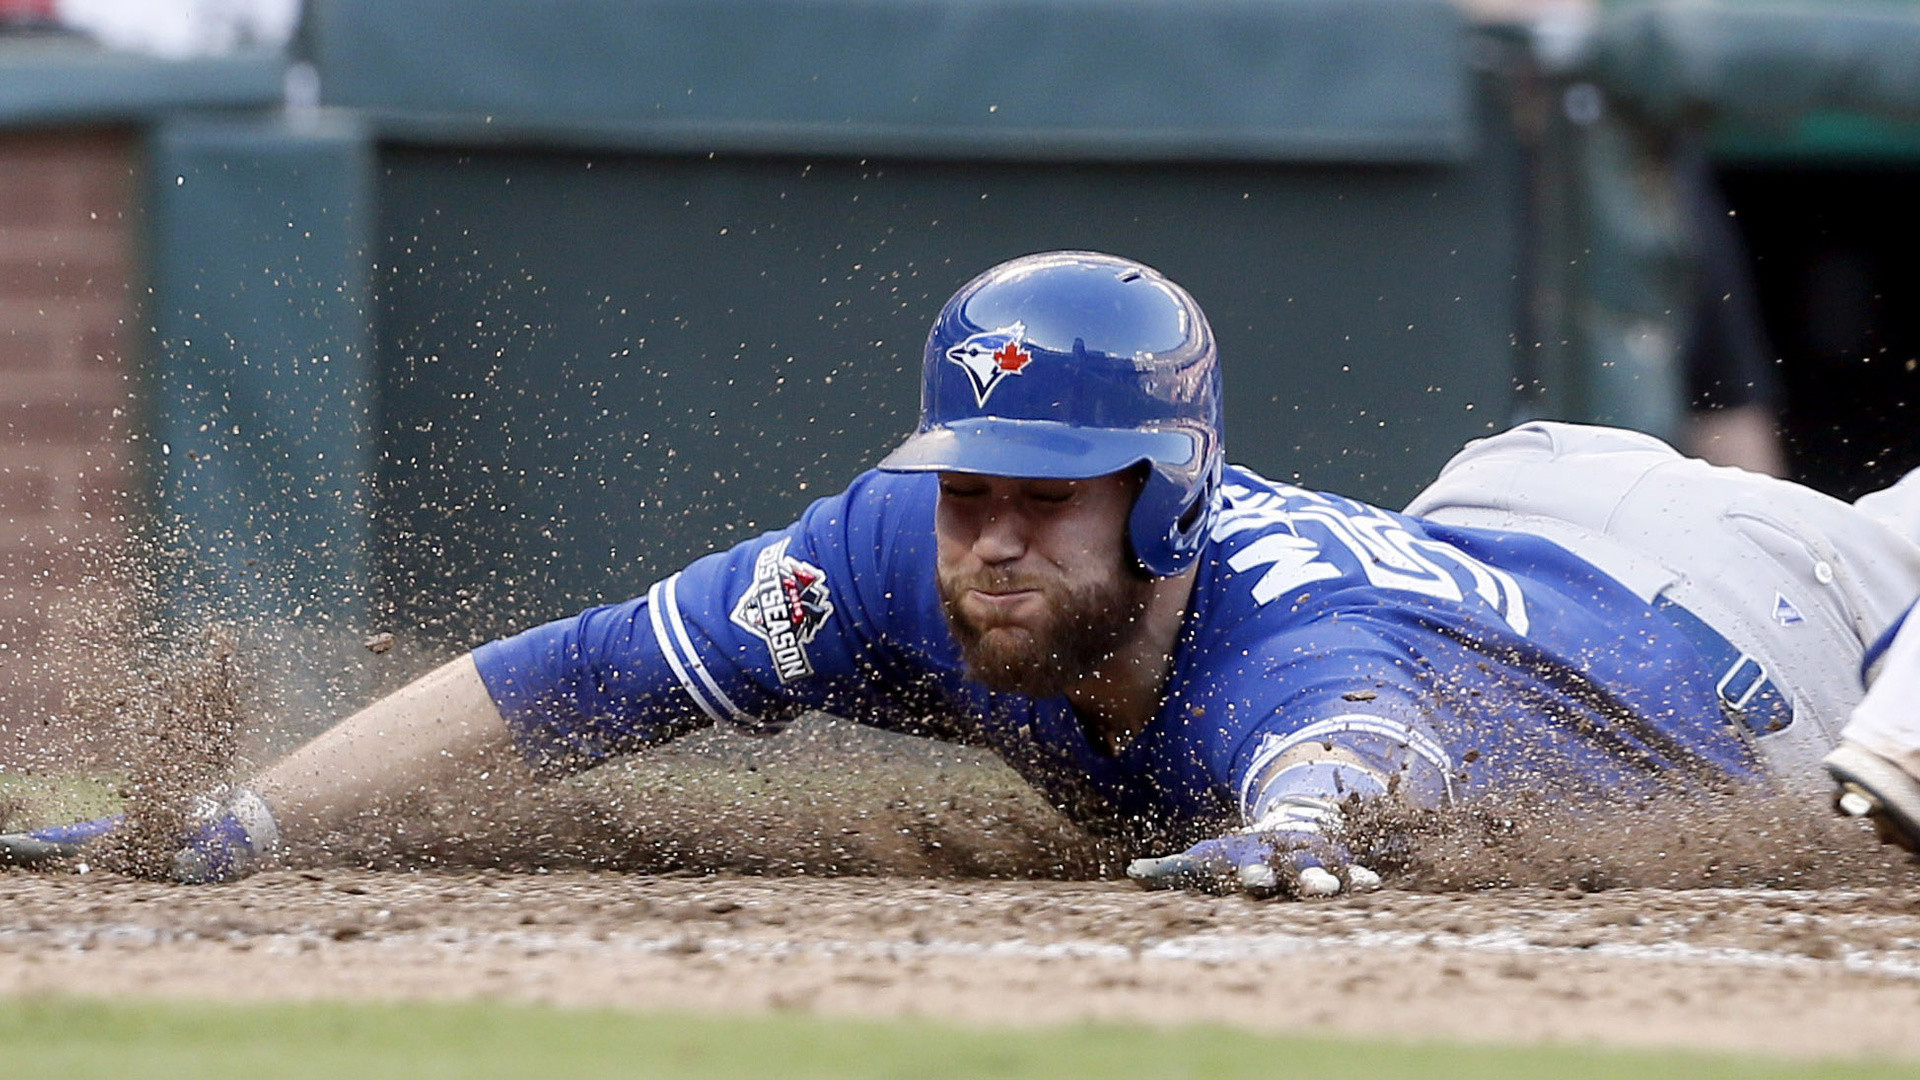 Sports, Baseball, Toronto Blue Jays, Toronto Blue Jays Baseball Mlb Player,  Mlb